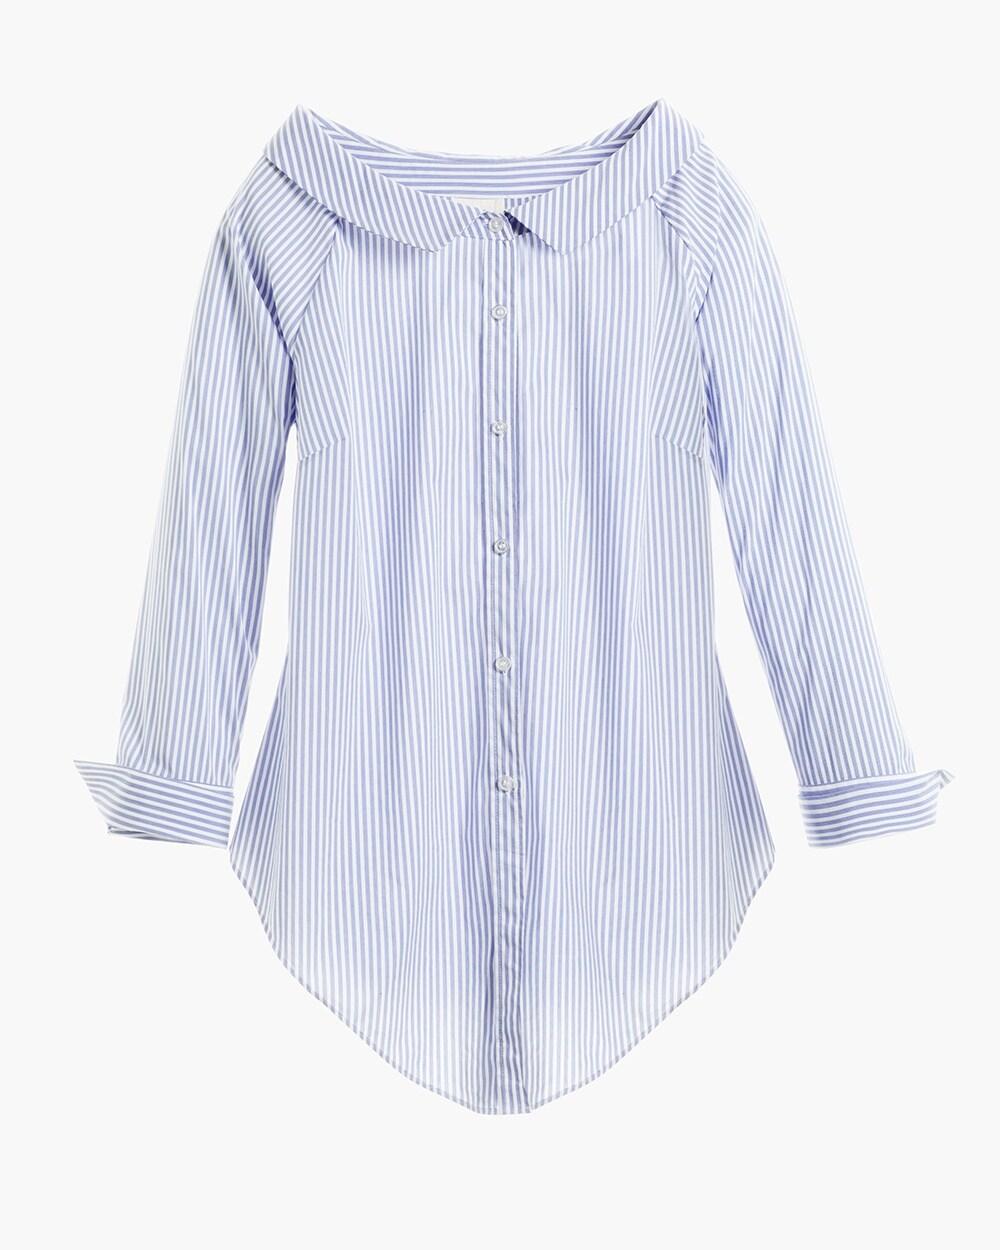 Panama Striped Portrait Shirt Chico S